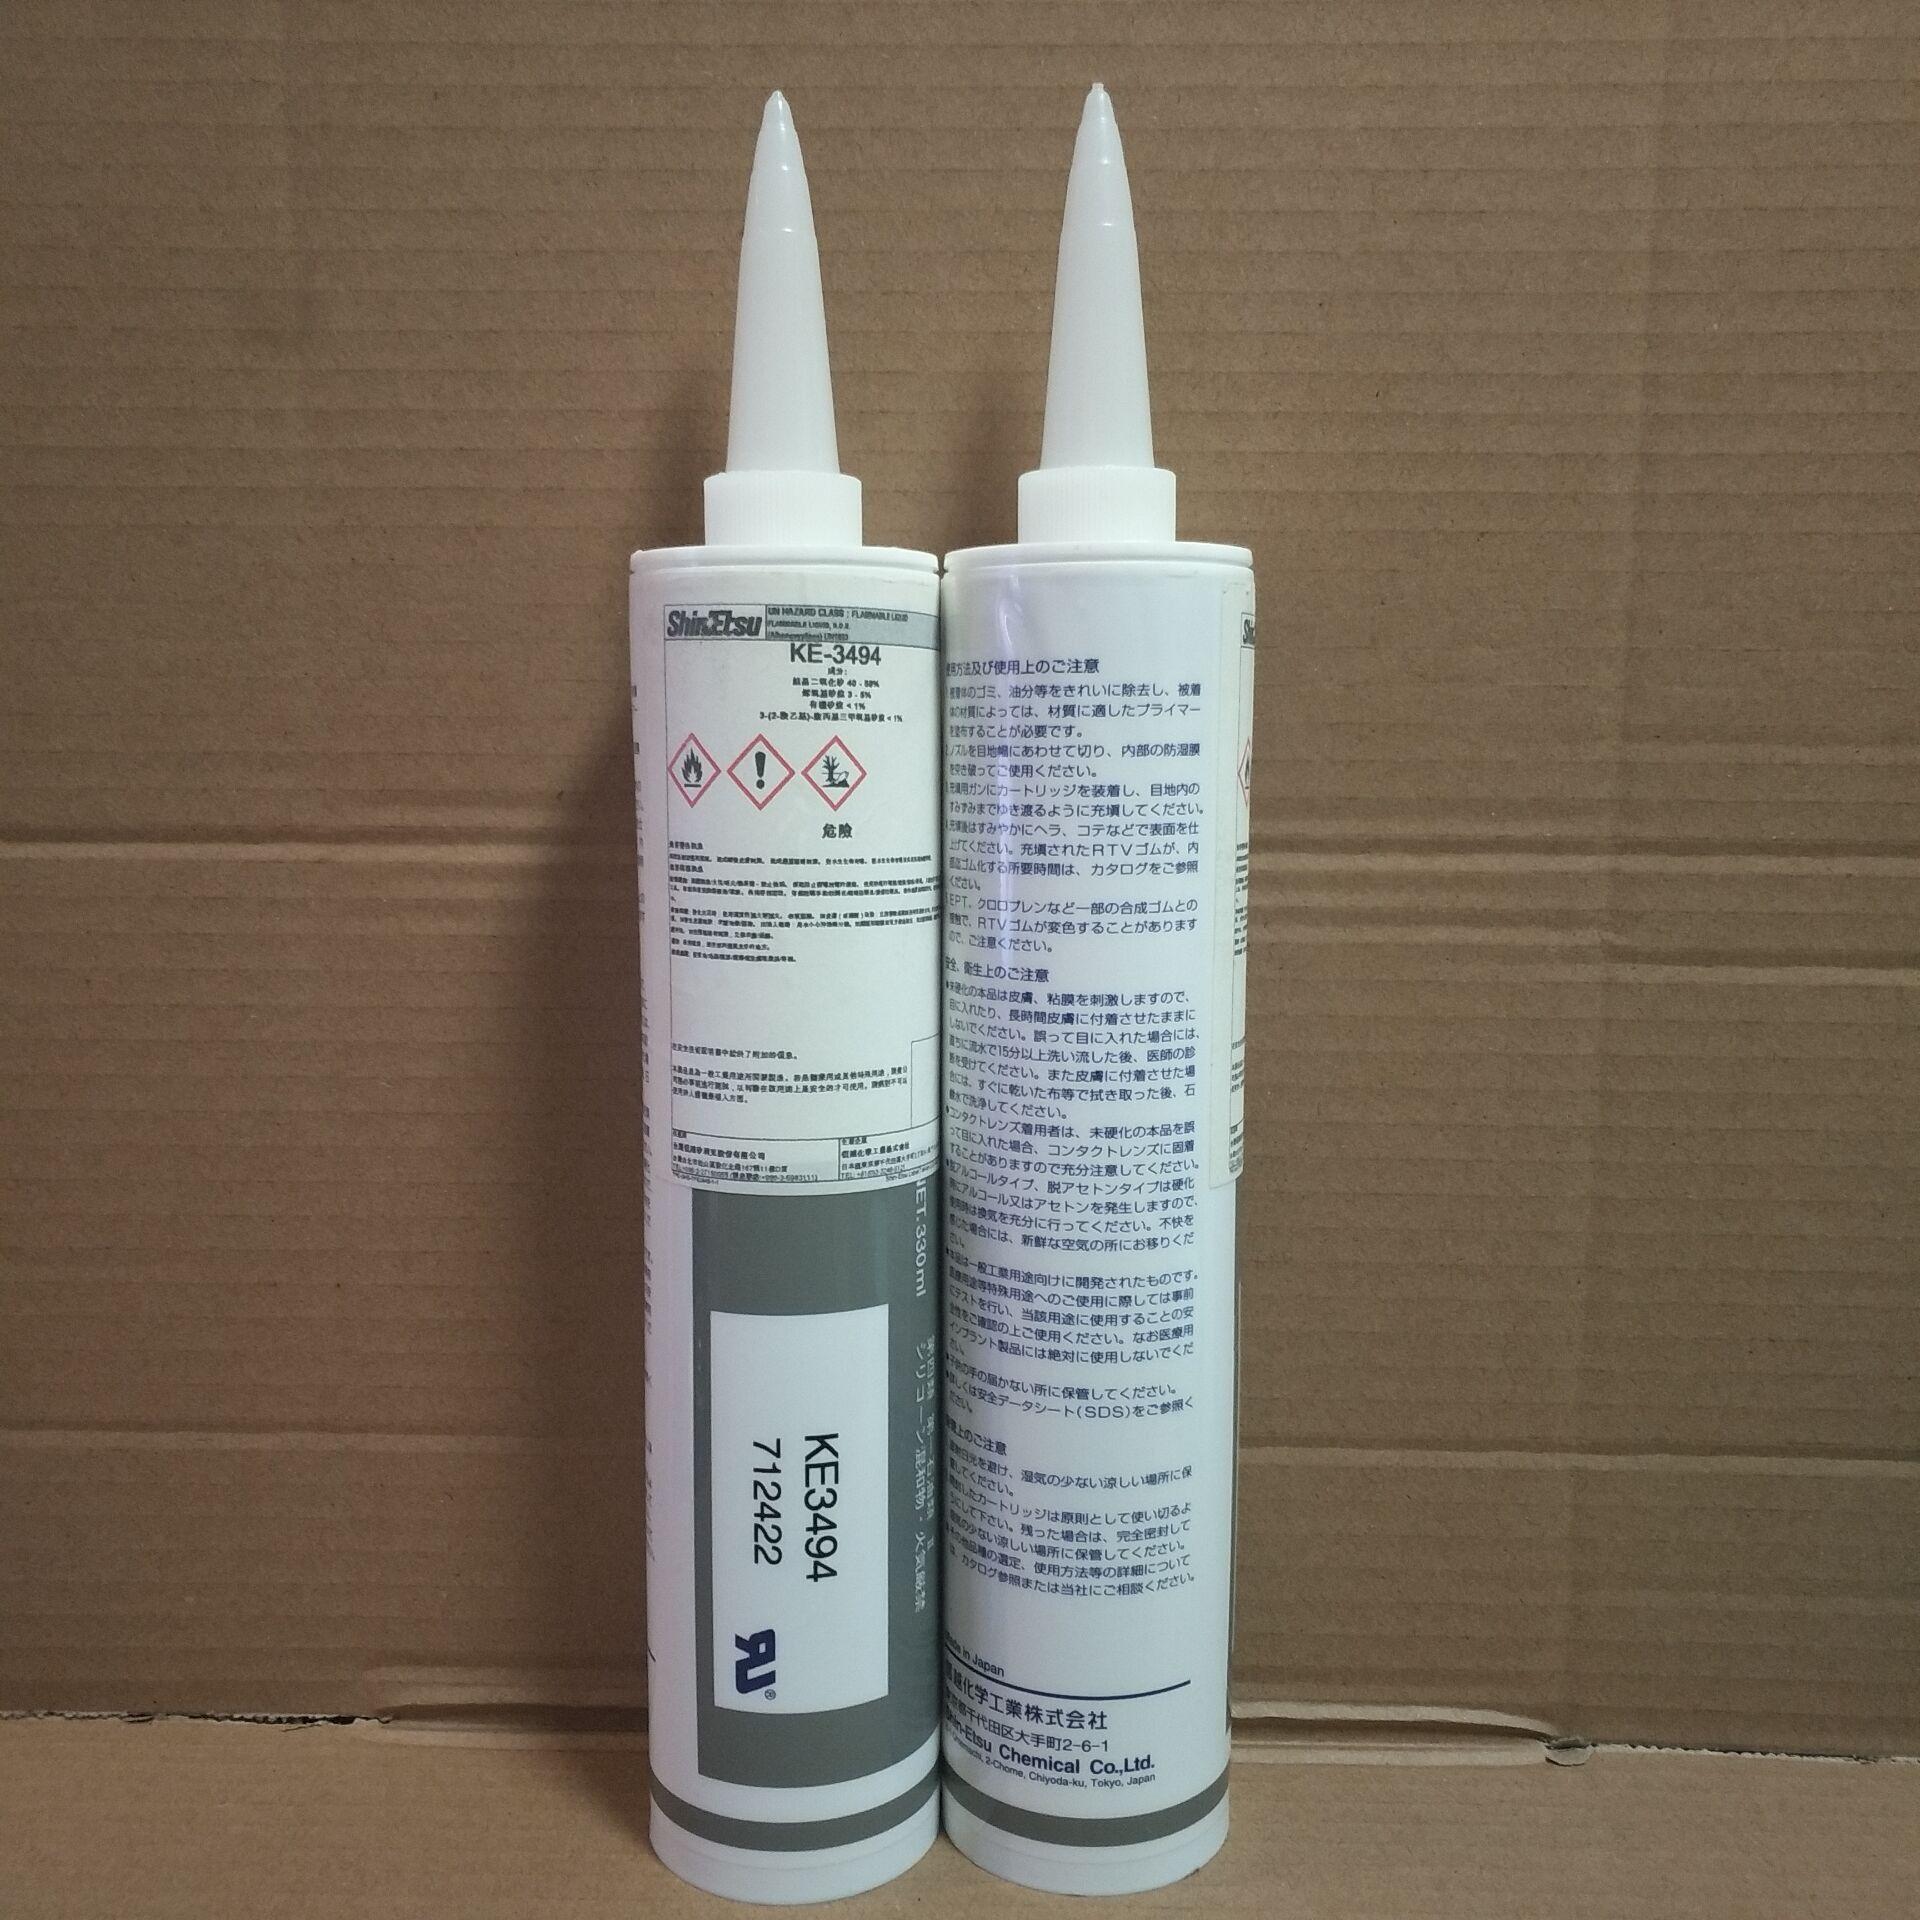 ShinEtsu信越KE-3494导热胶抗冷热耐老化绝缘防潮灰色密封硅胶水 1